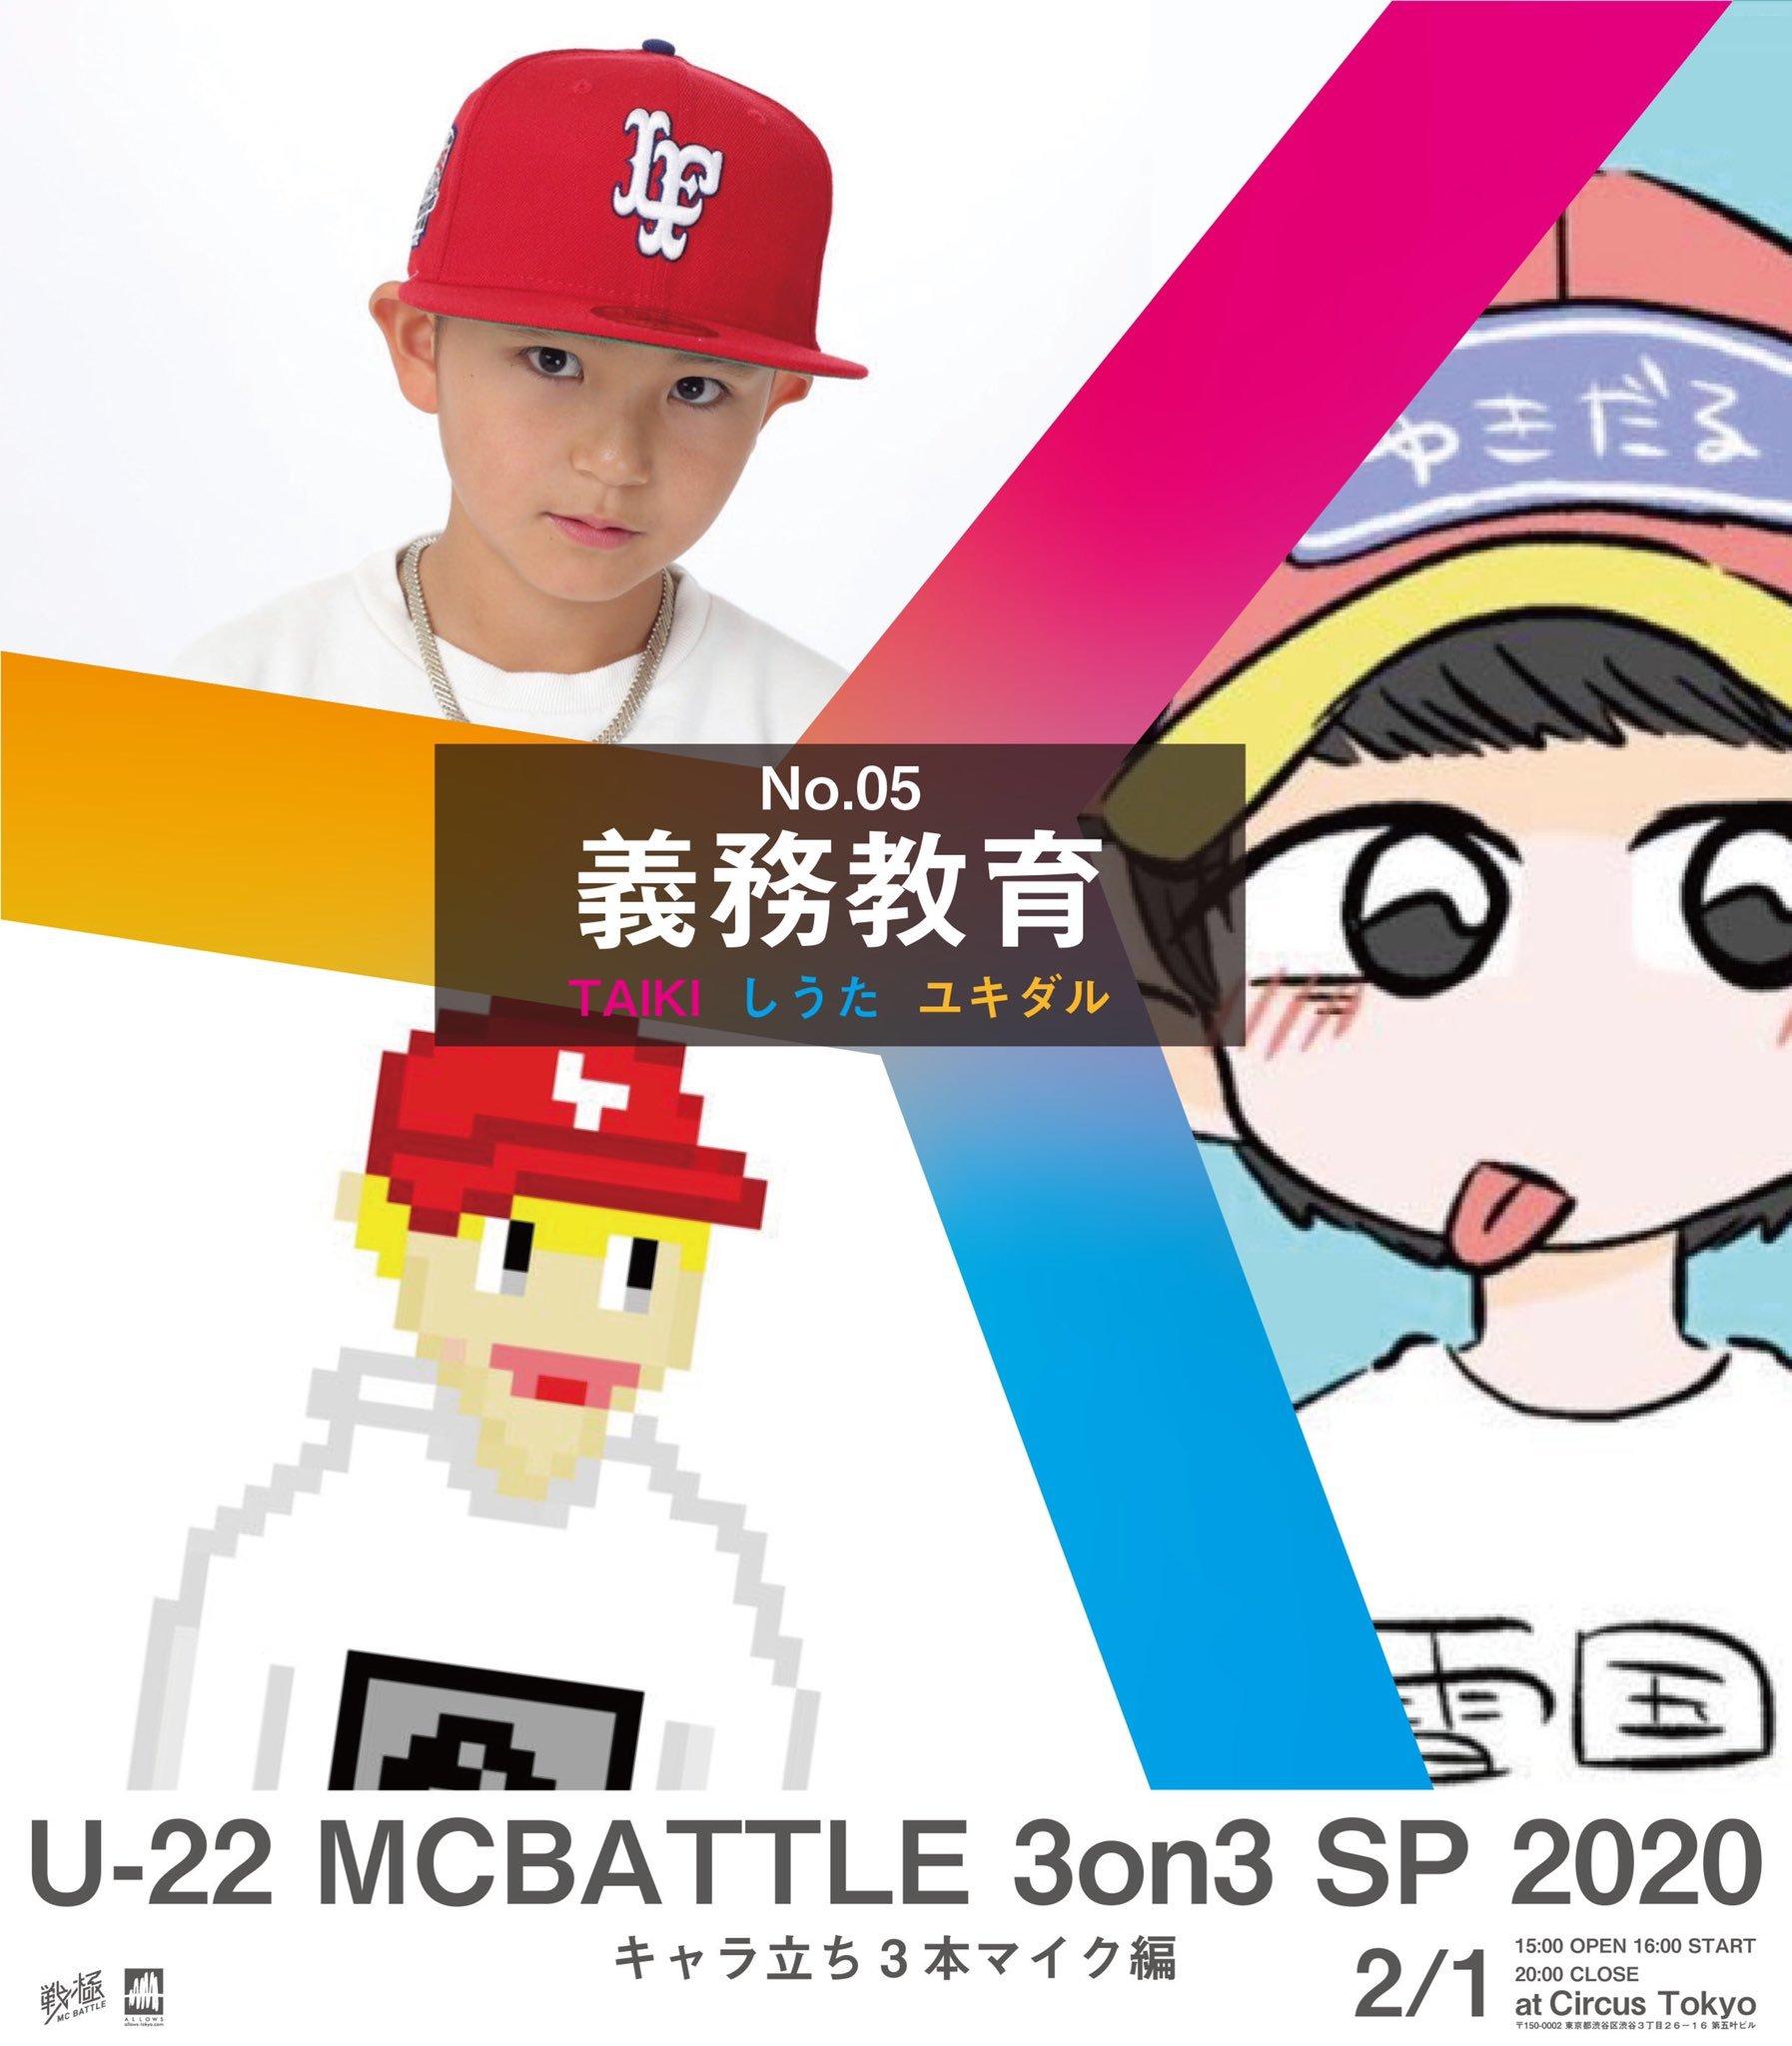 2/1 U-22 MCBATTLE 3on3 SP 2020 チケット販売開始!8チーム中!_e0246863_16332462.jpg